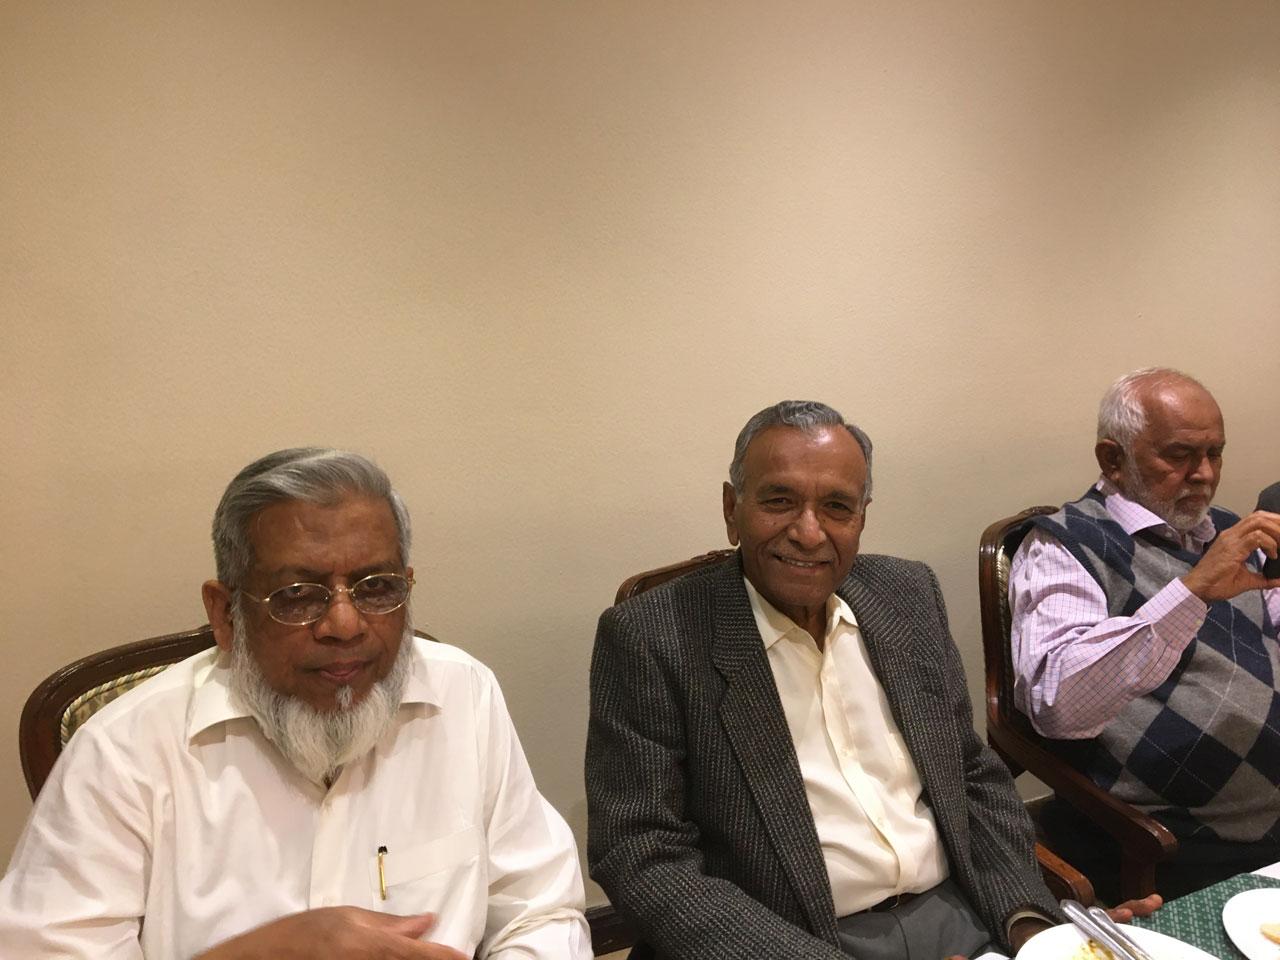 Engr. Iqbal Ahmed Khan, Engr. Mohammad Afzal, Engr. Rahmatullah Ganaai